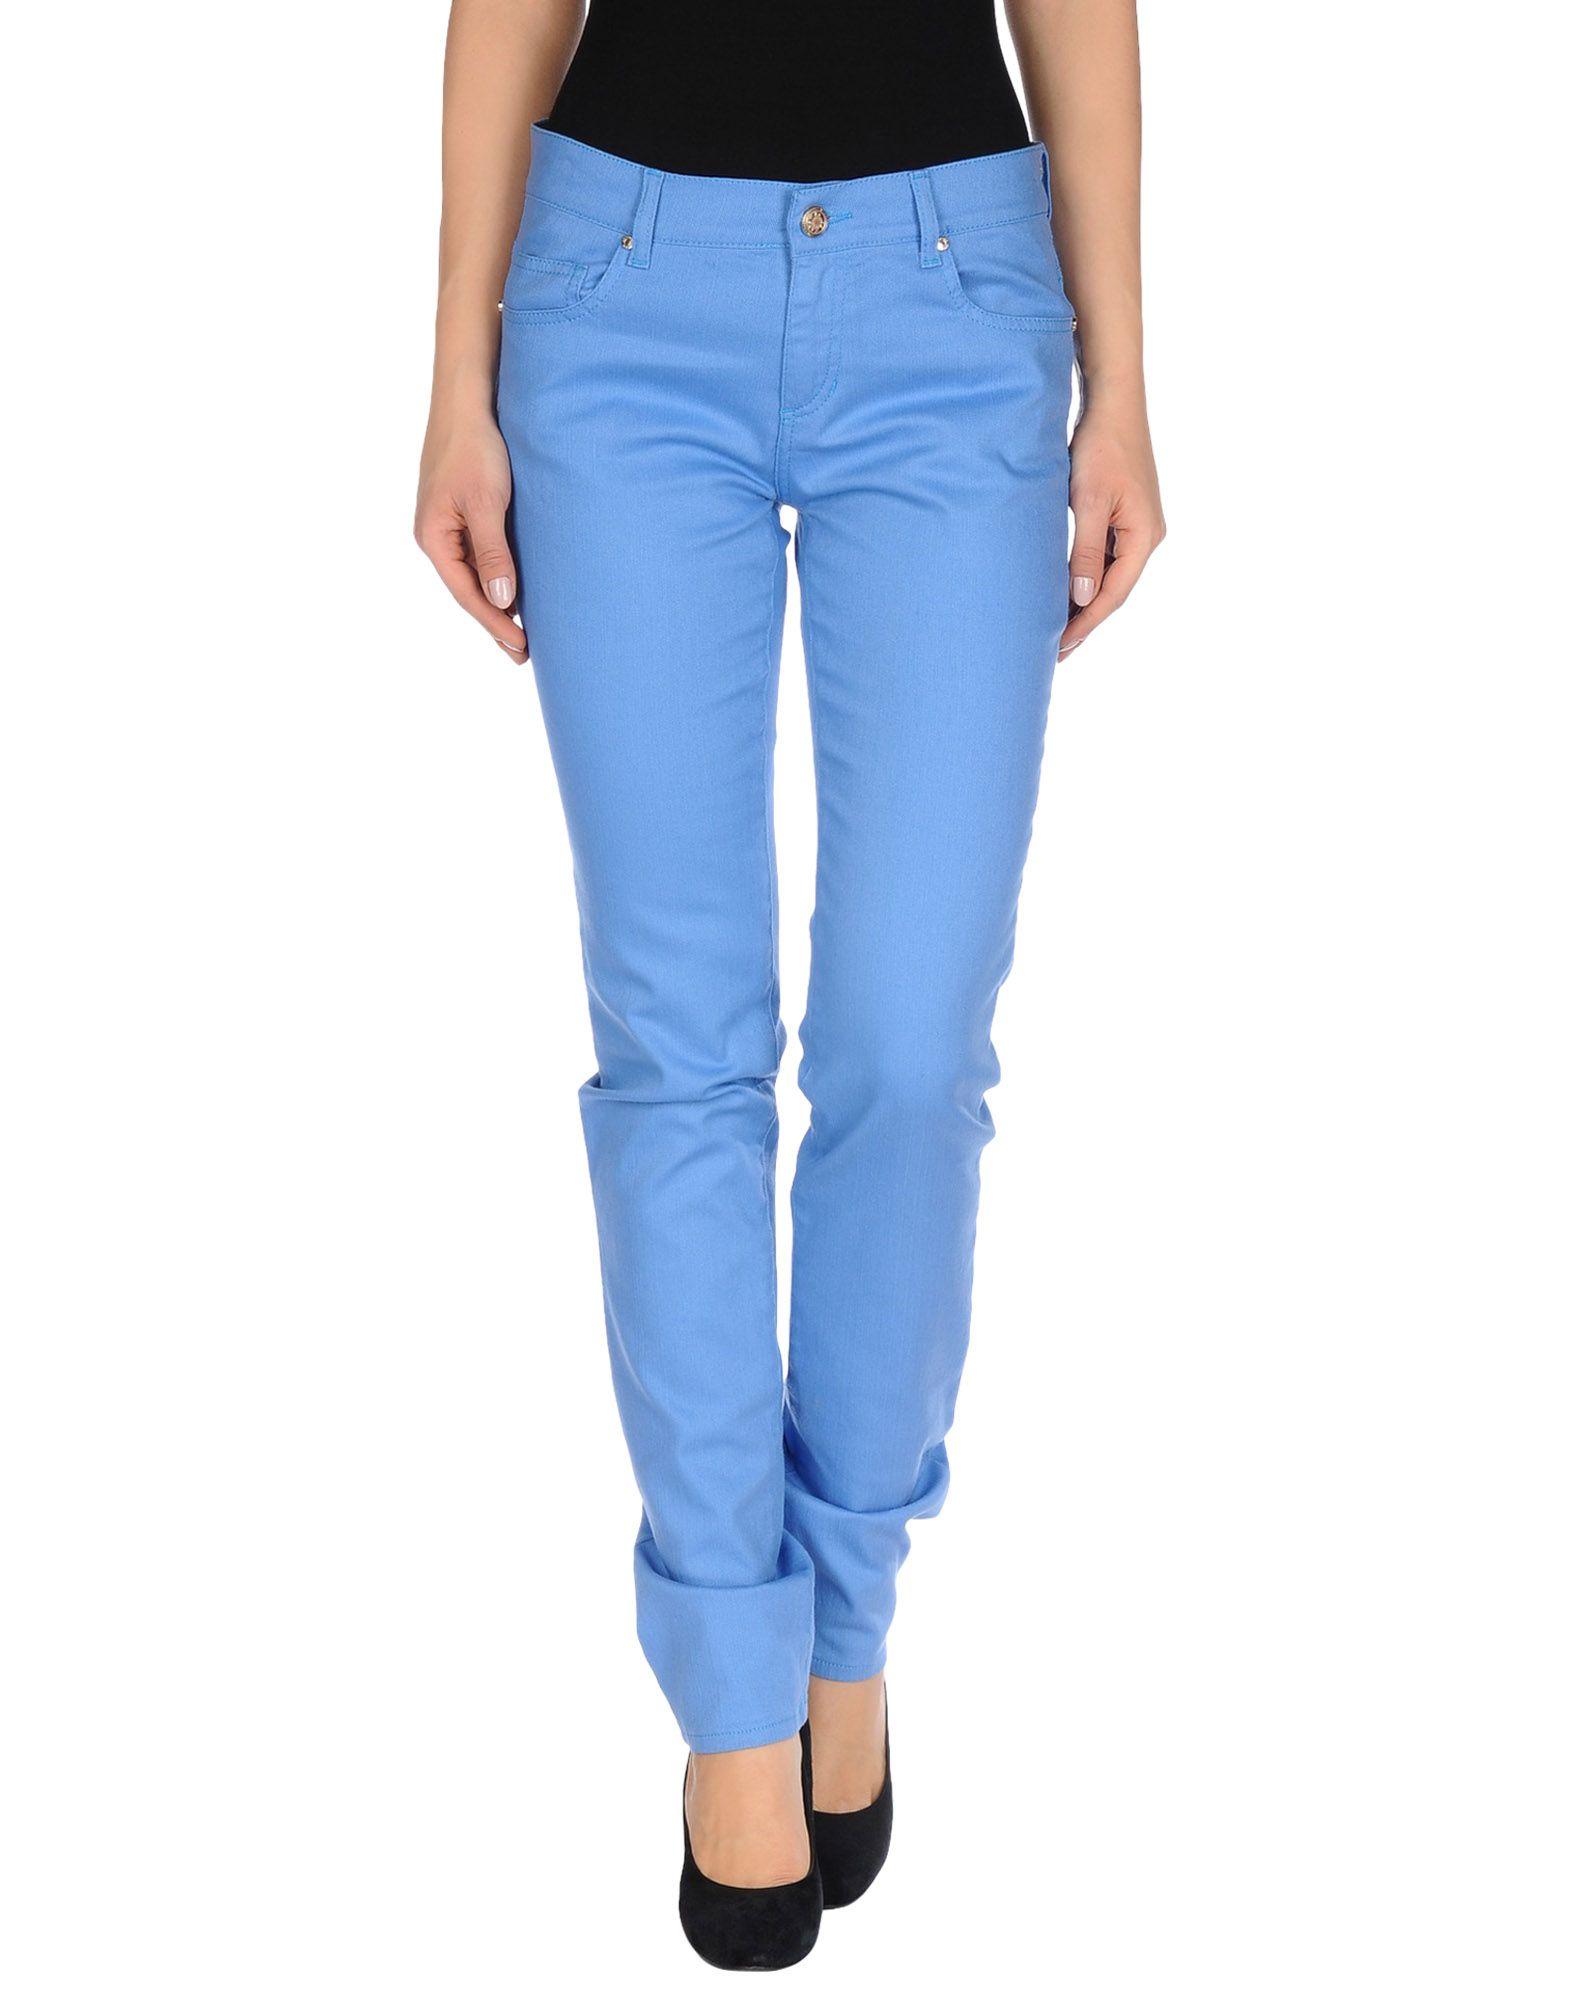 Simple Versace Jeans Women39s Black Casual Trouser